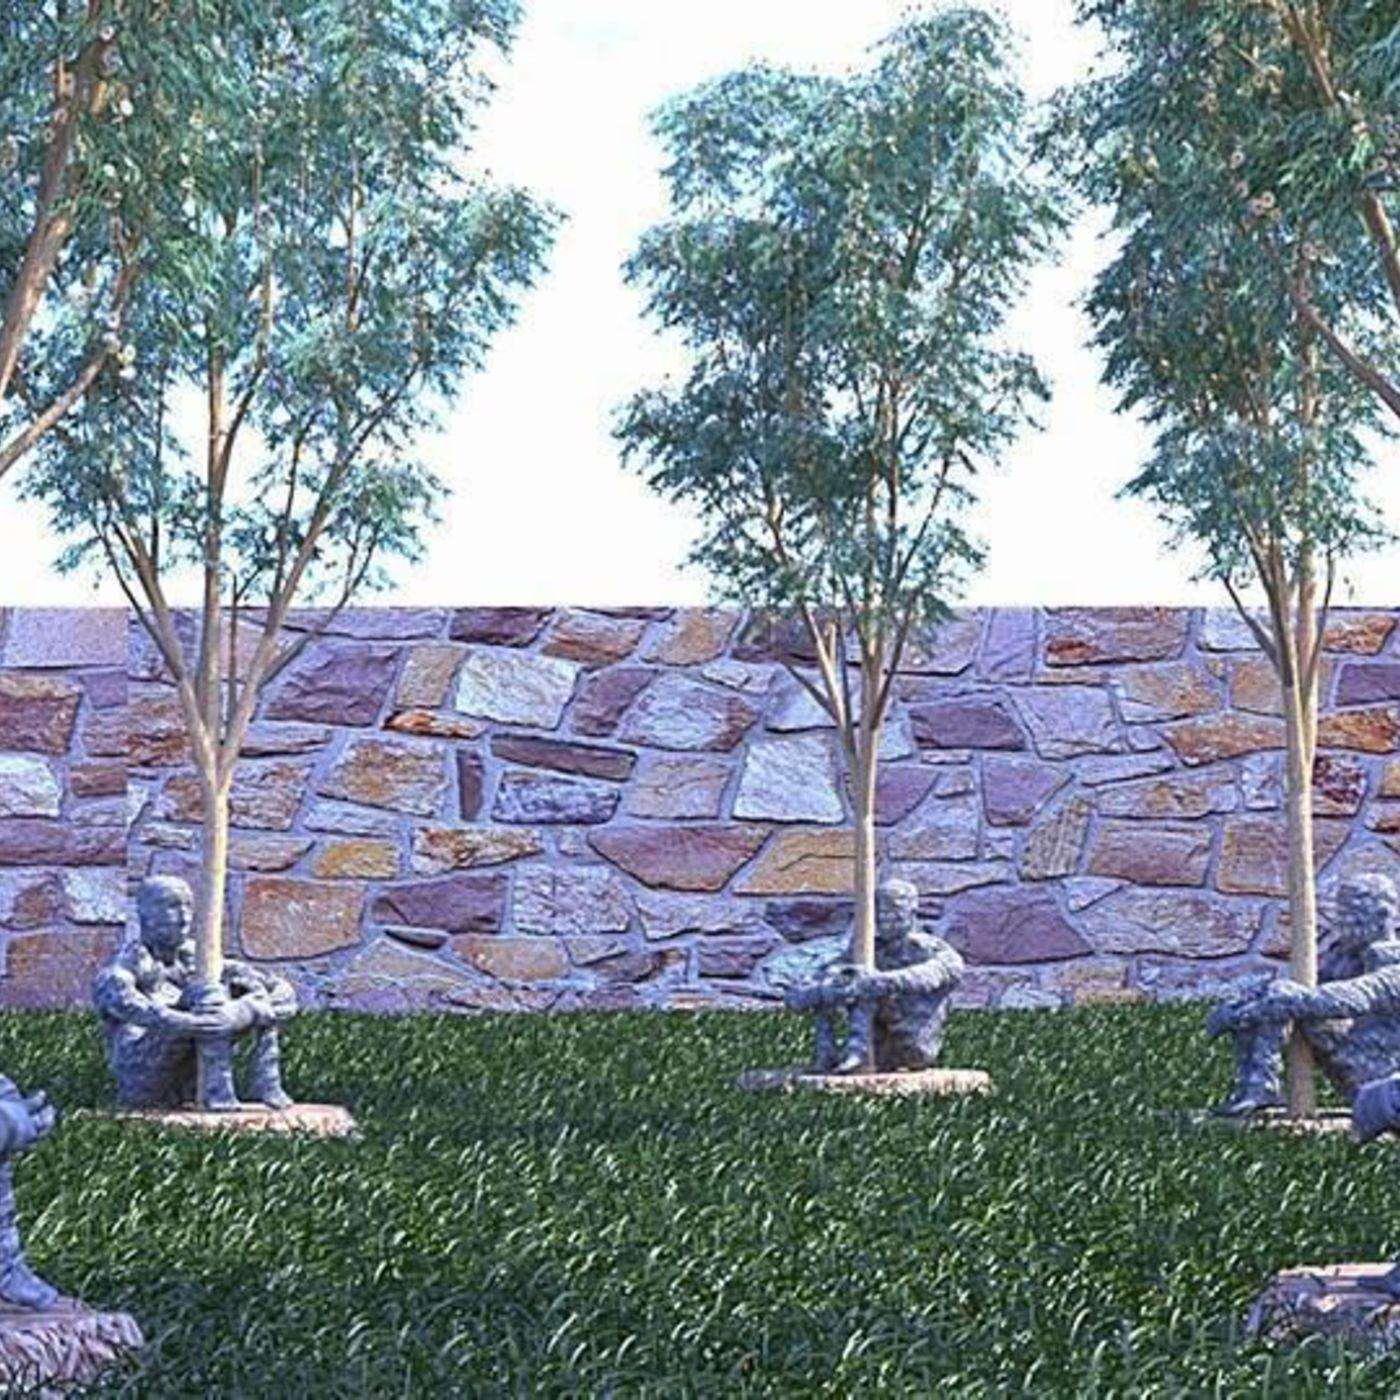 Statue of men guarding trees